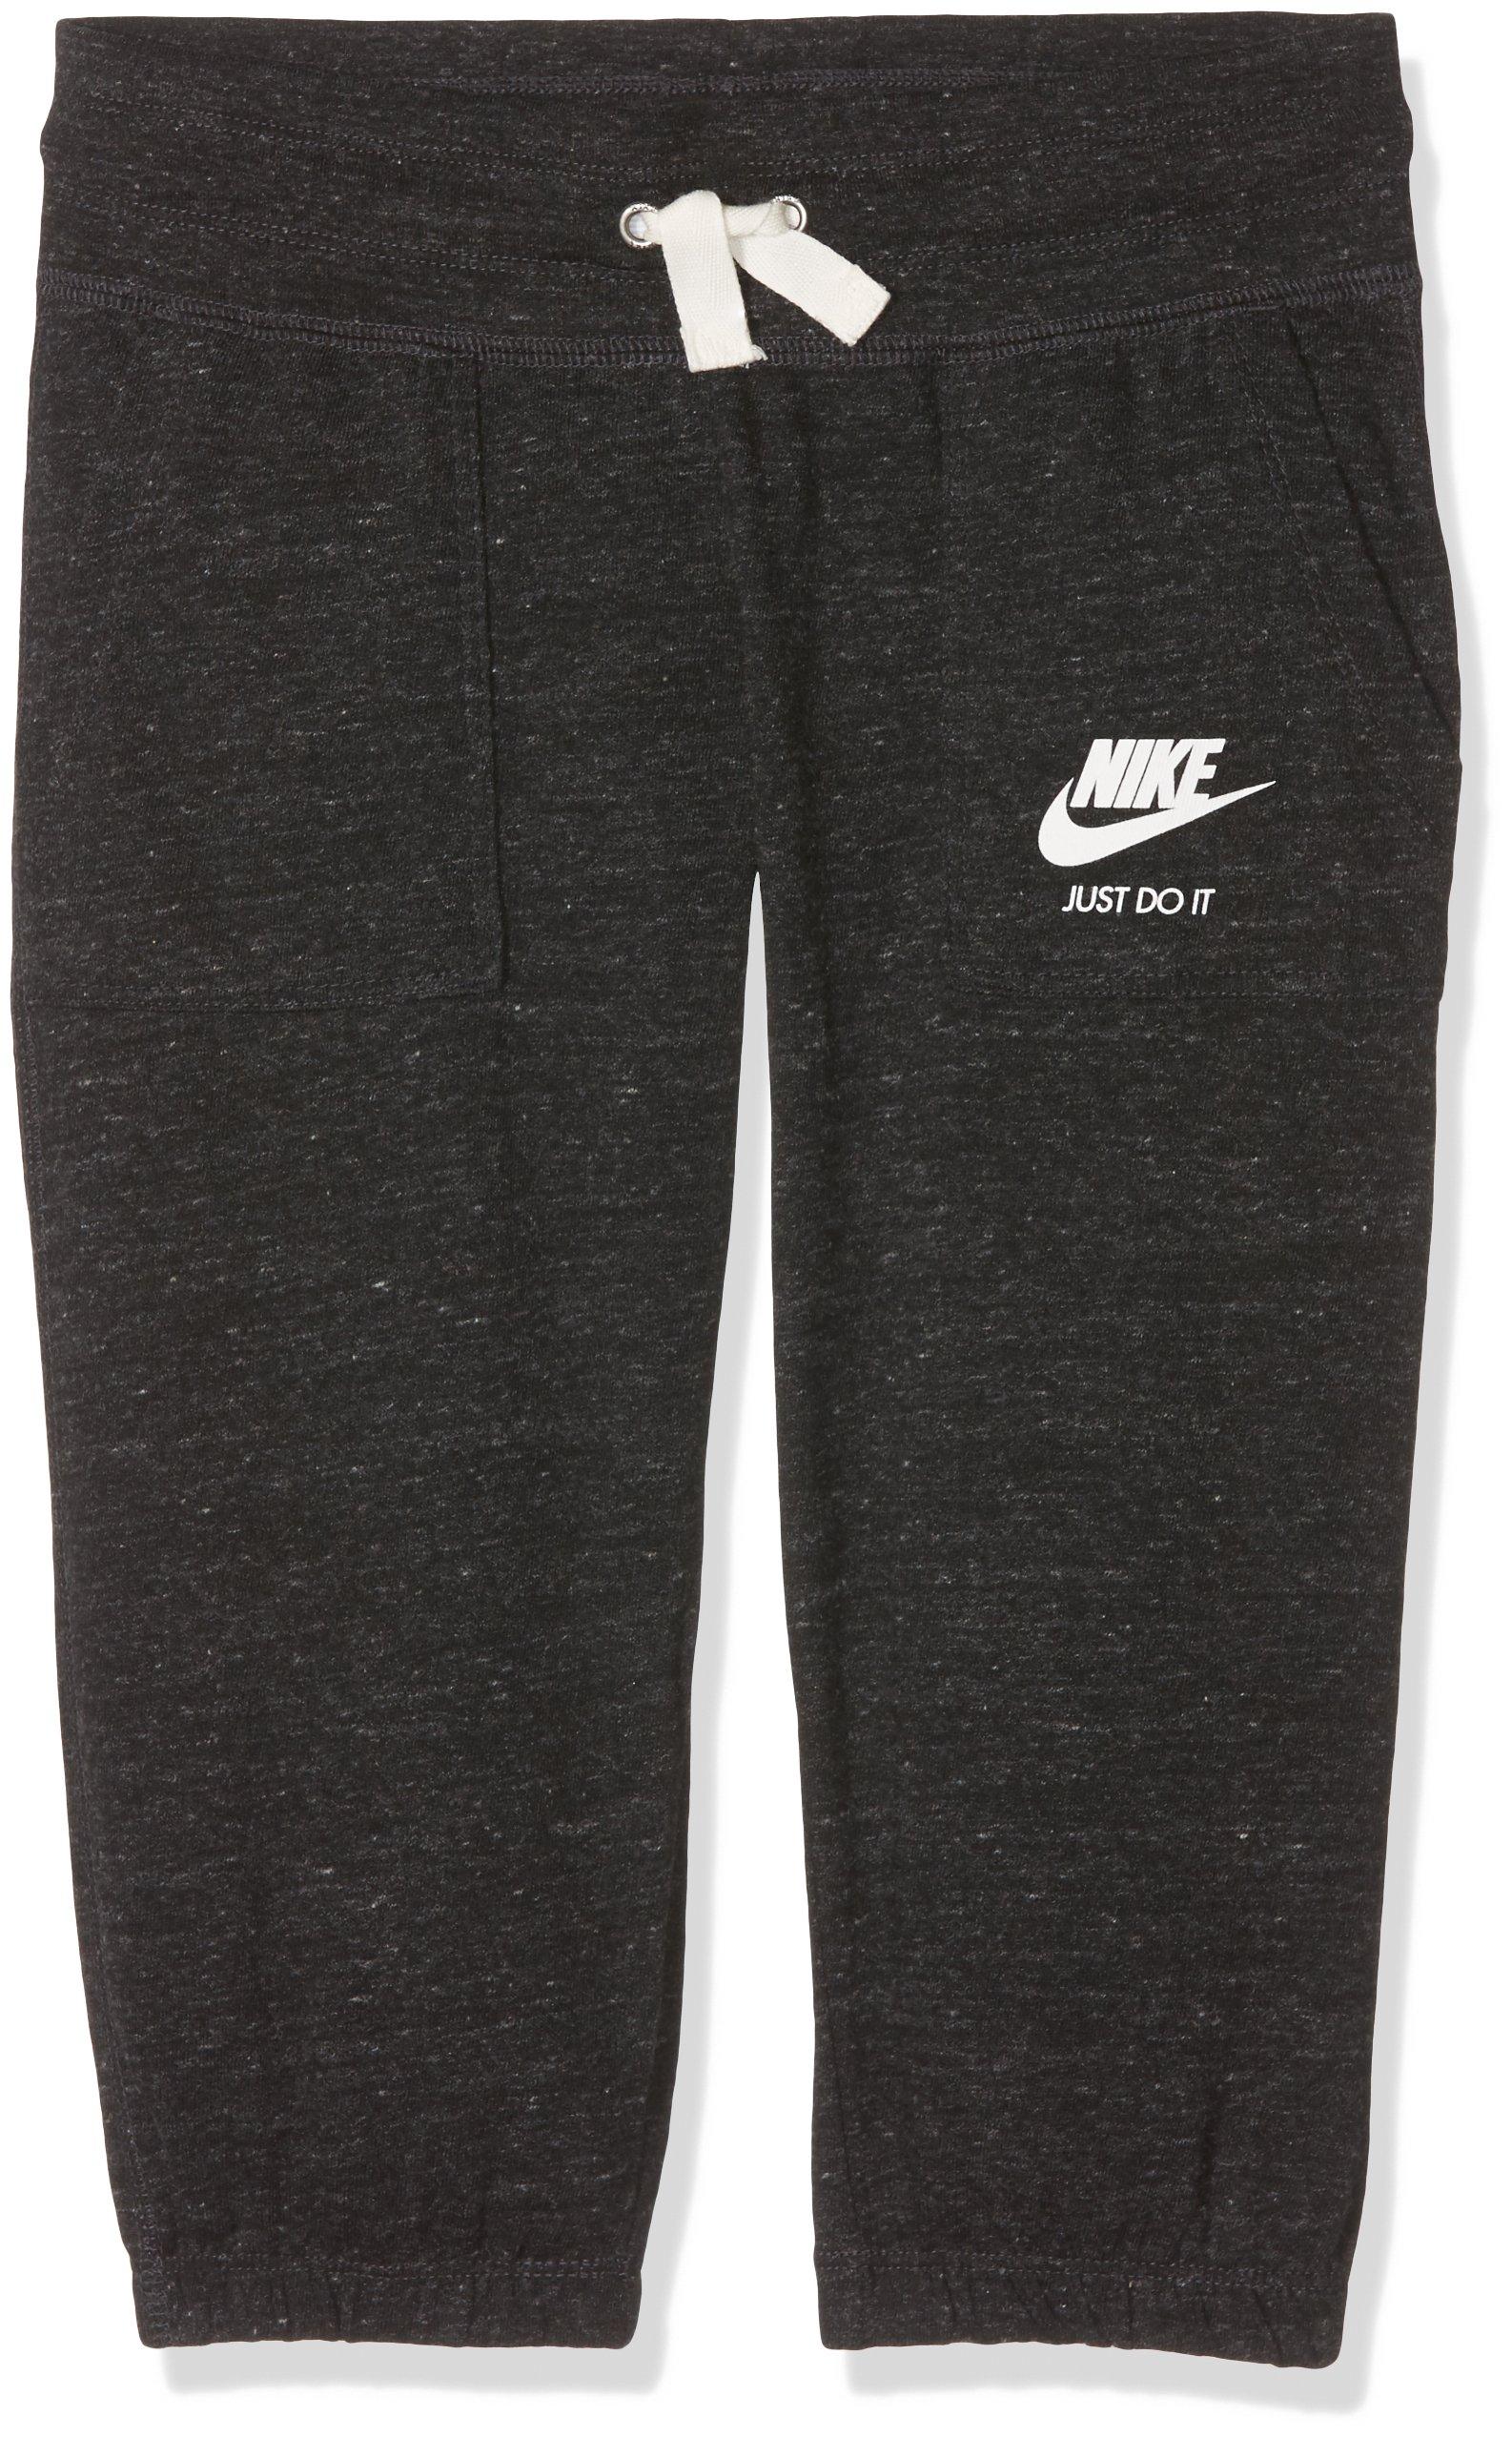 Nike Sportswear Gym Vintage Big Kids' (Girls') Capris, Anthracite/Sail, Size L